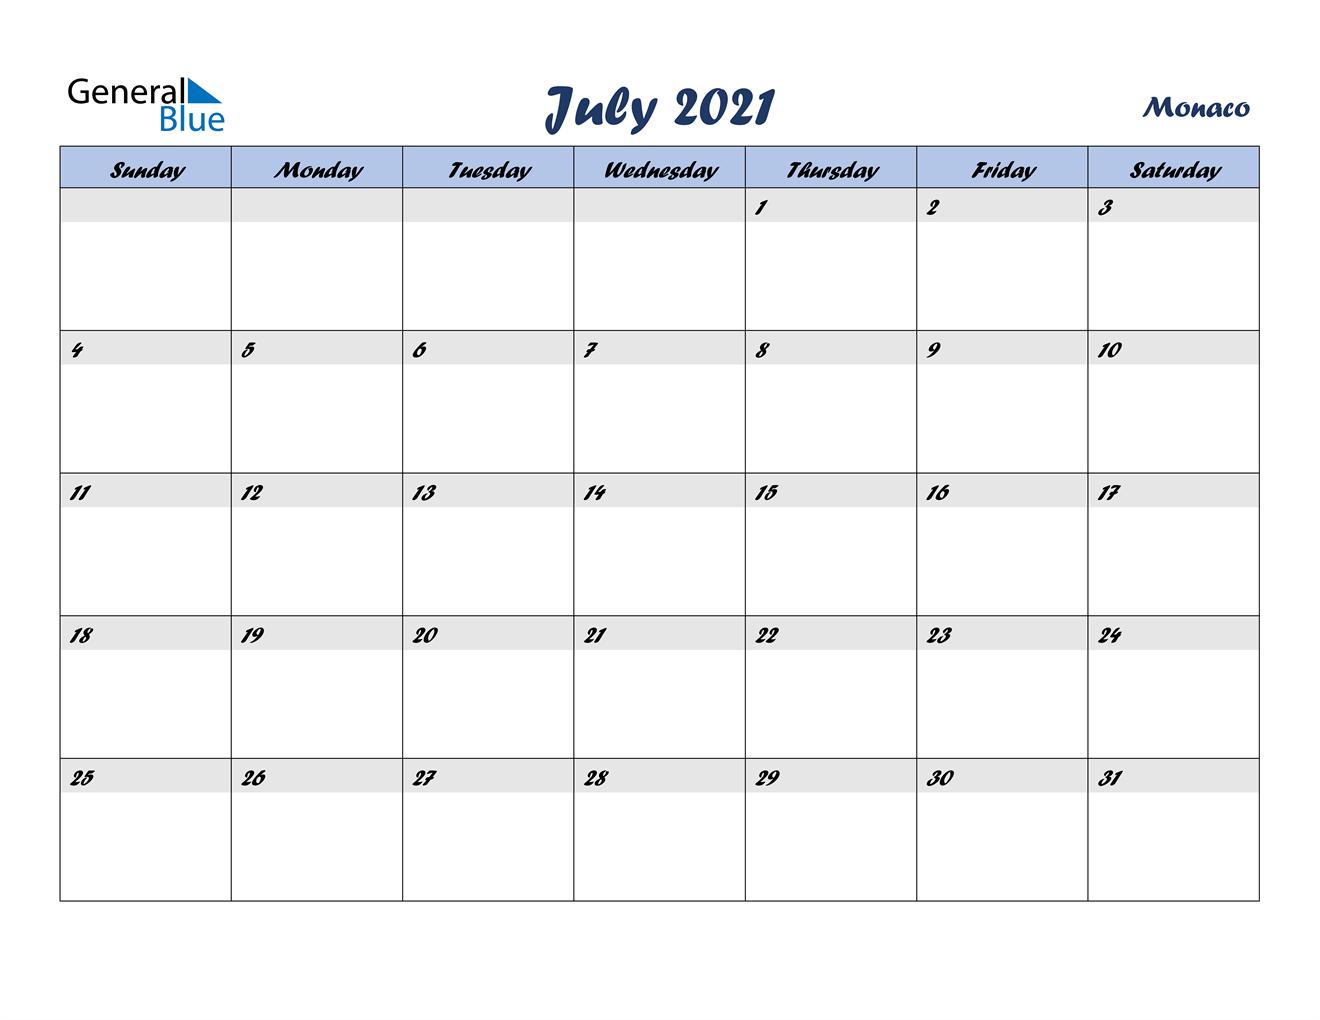 July 2021 Calendar - Monaco